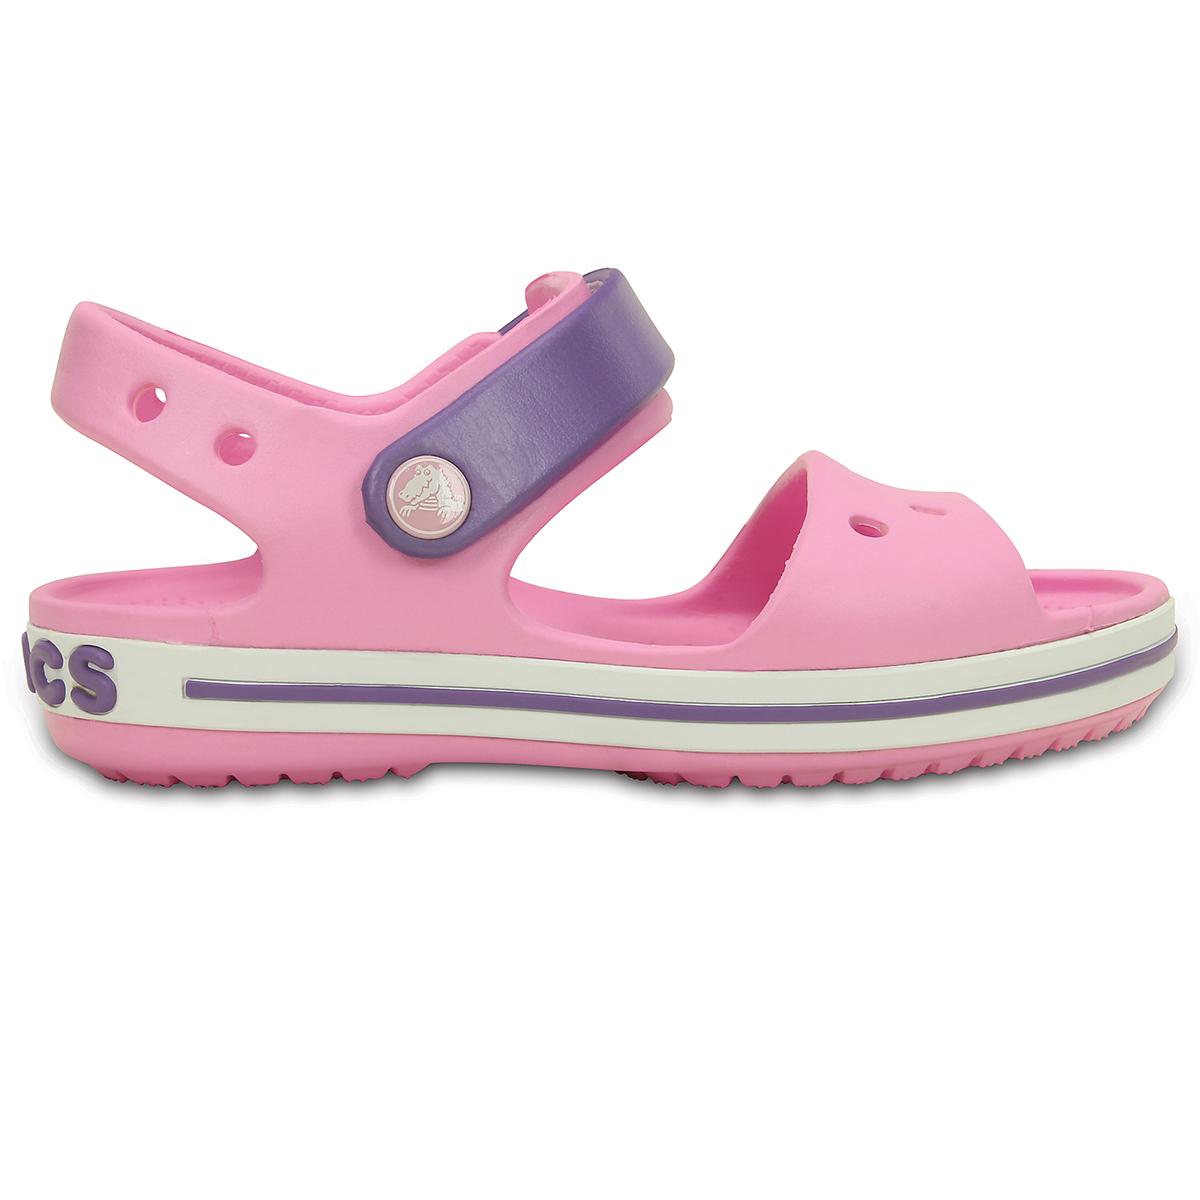 Crocs Crocband Sandal Kids - Karanfil/Mavi Menekşe